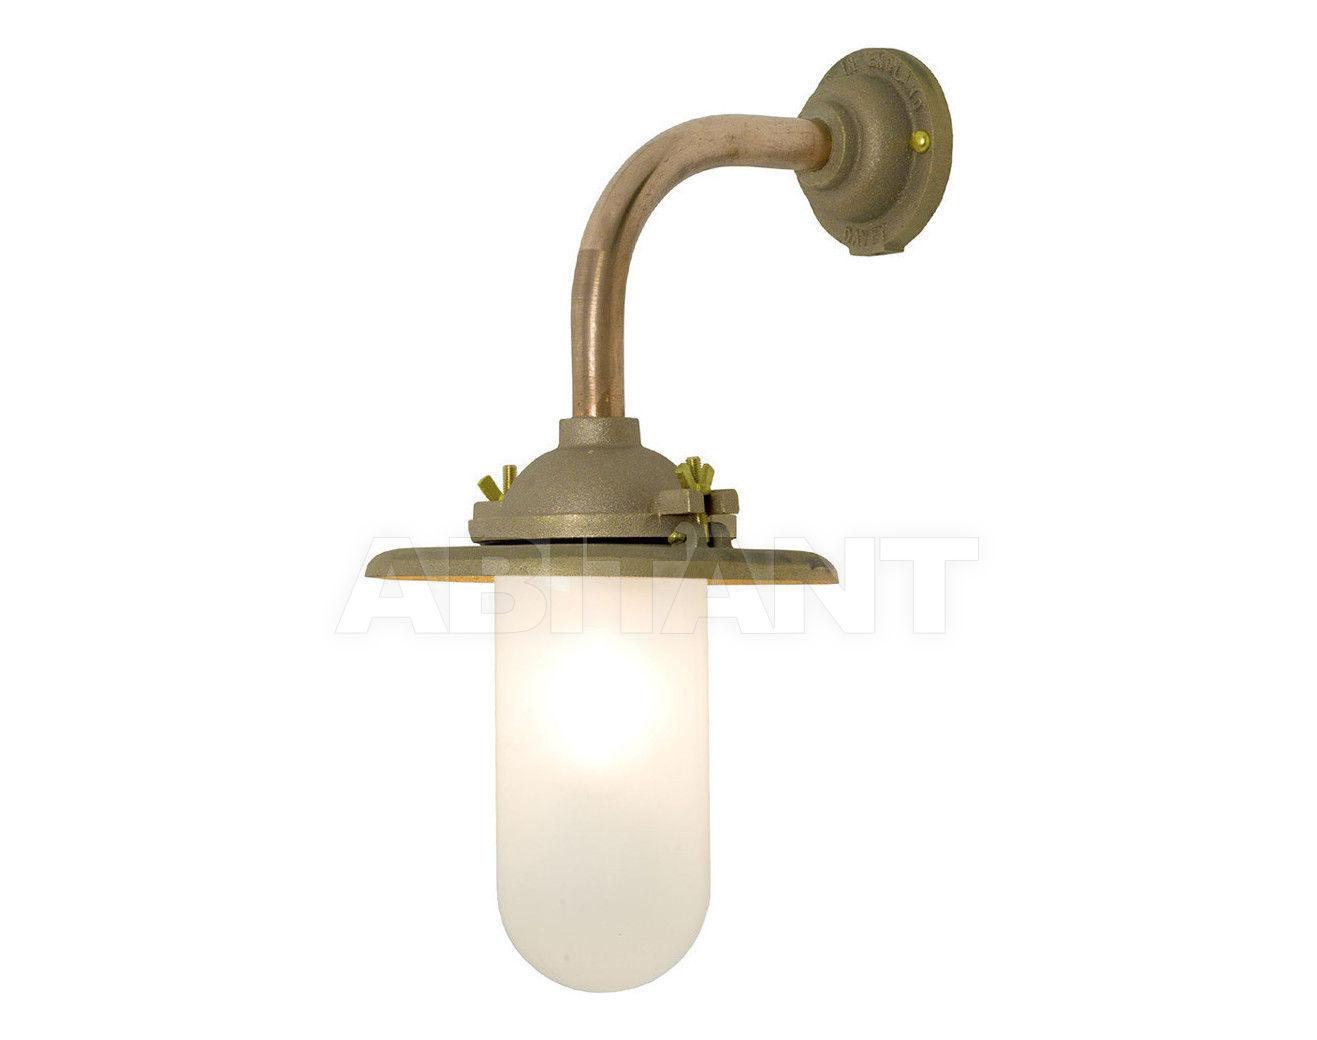 Купить Фонарь Davey Lighting Wall Mounted Lights 7685/GM/060F/A